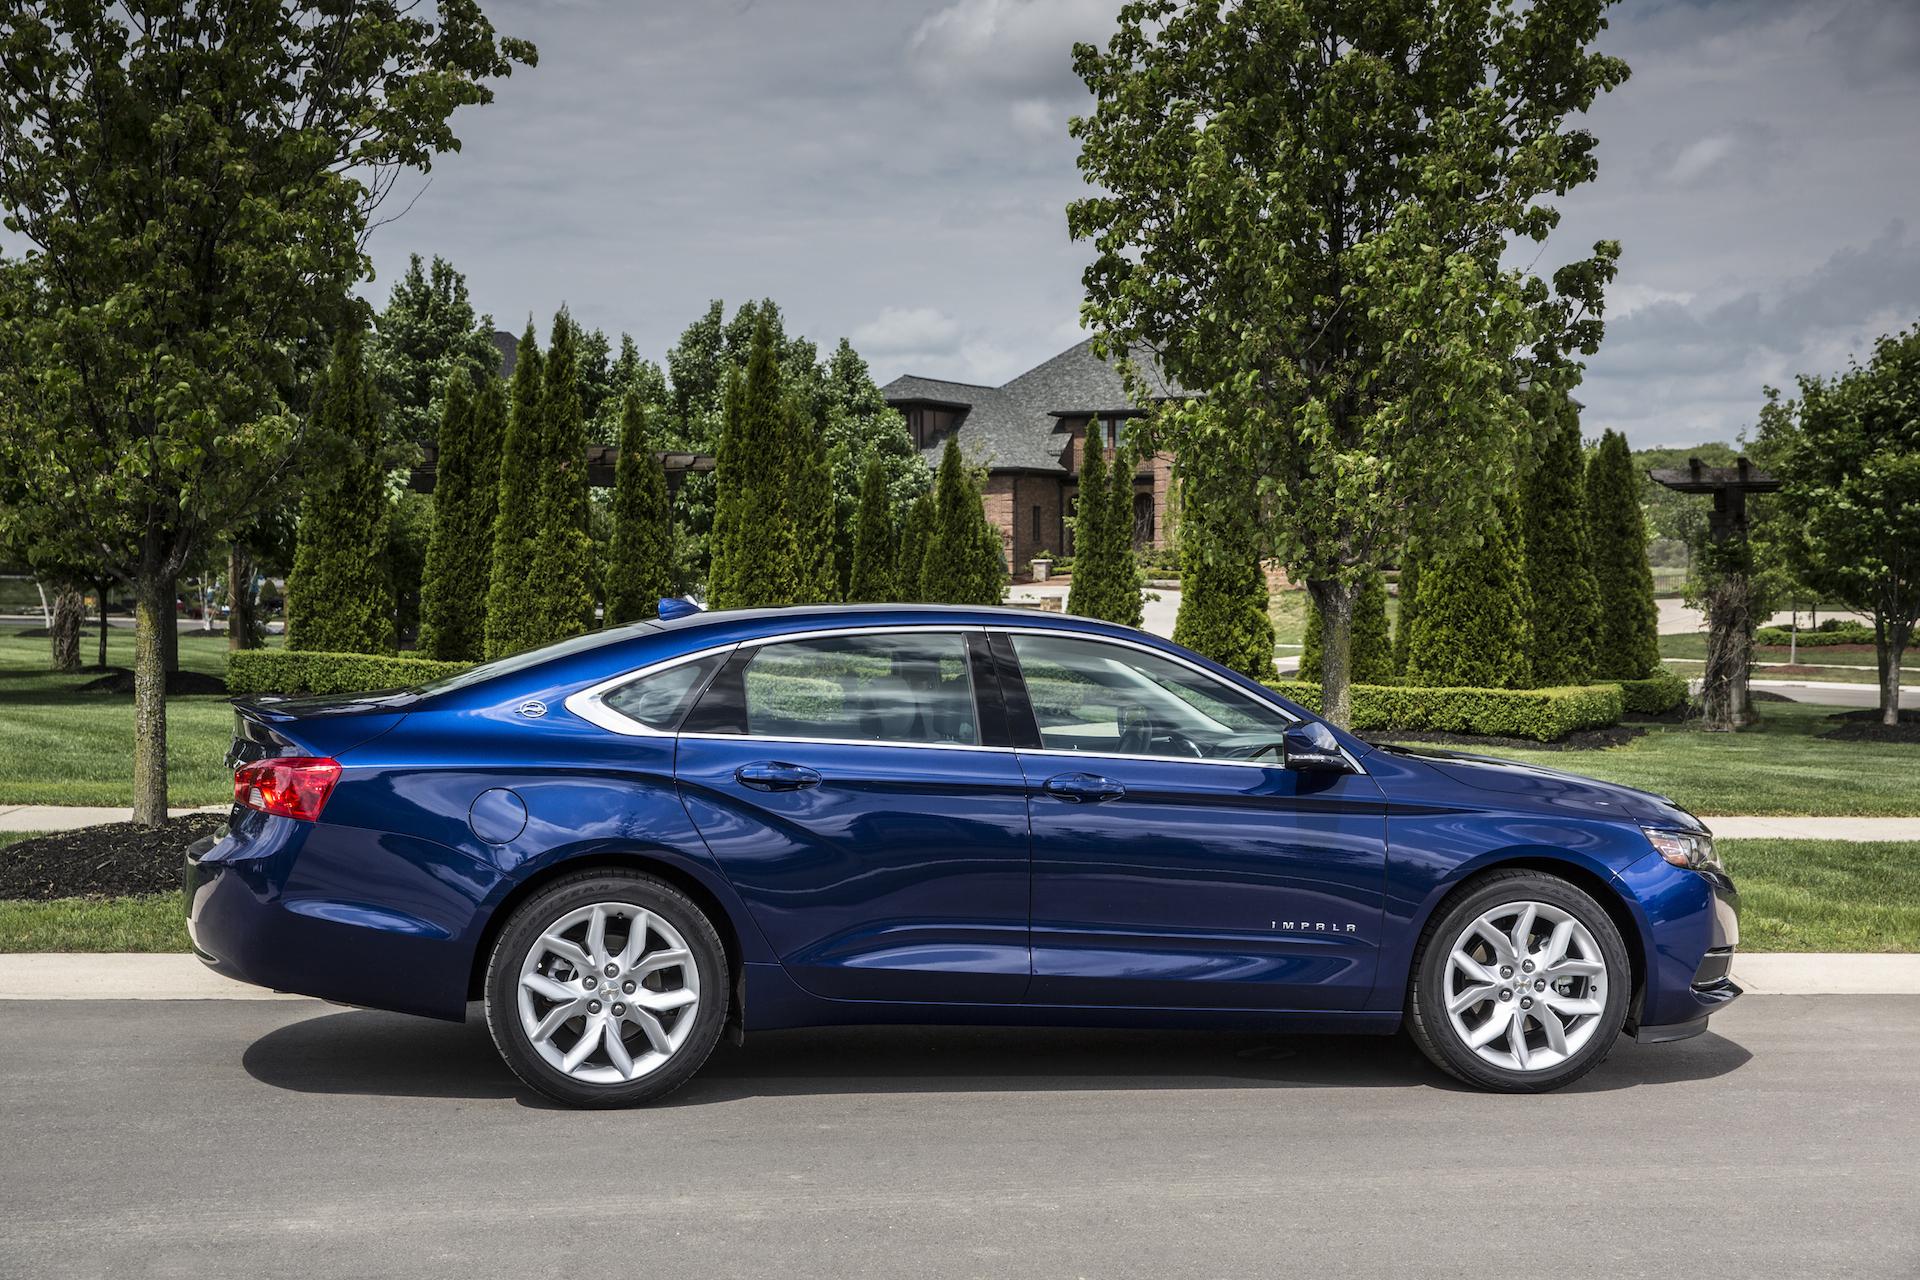 2016 Chevrolet Impala Blue Side Design